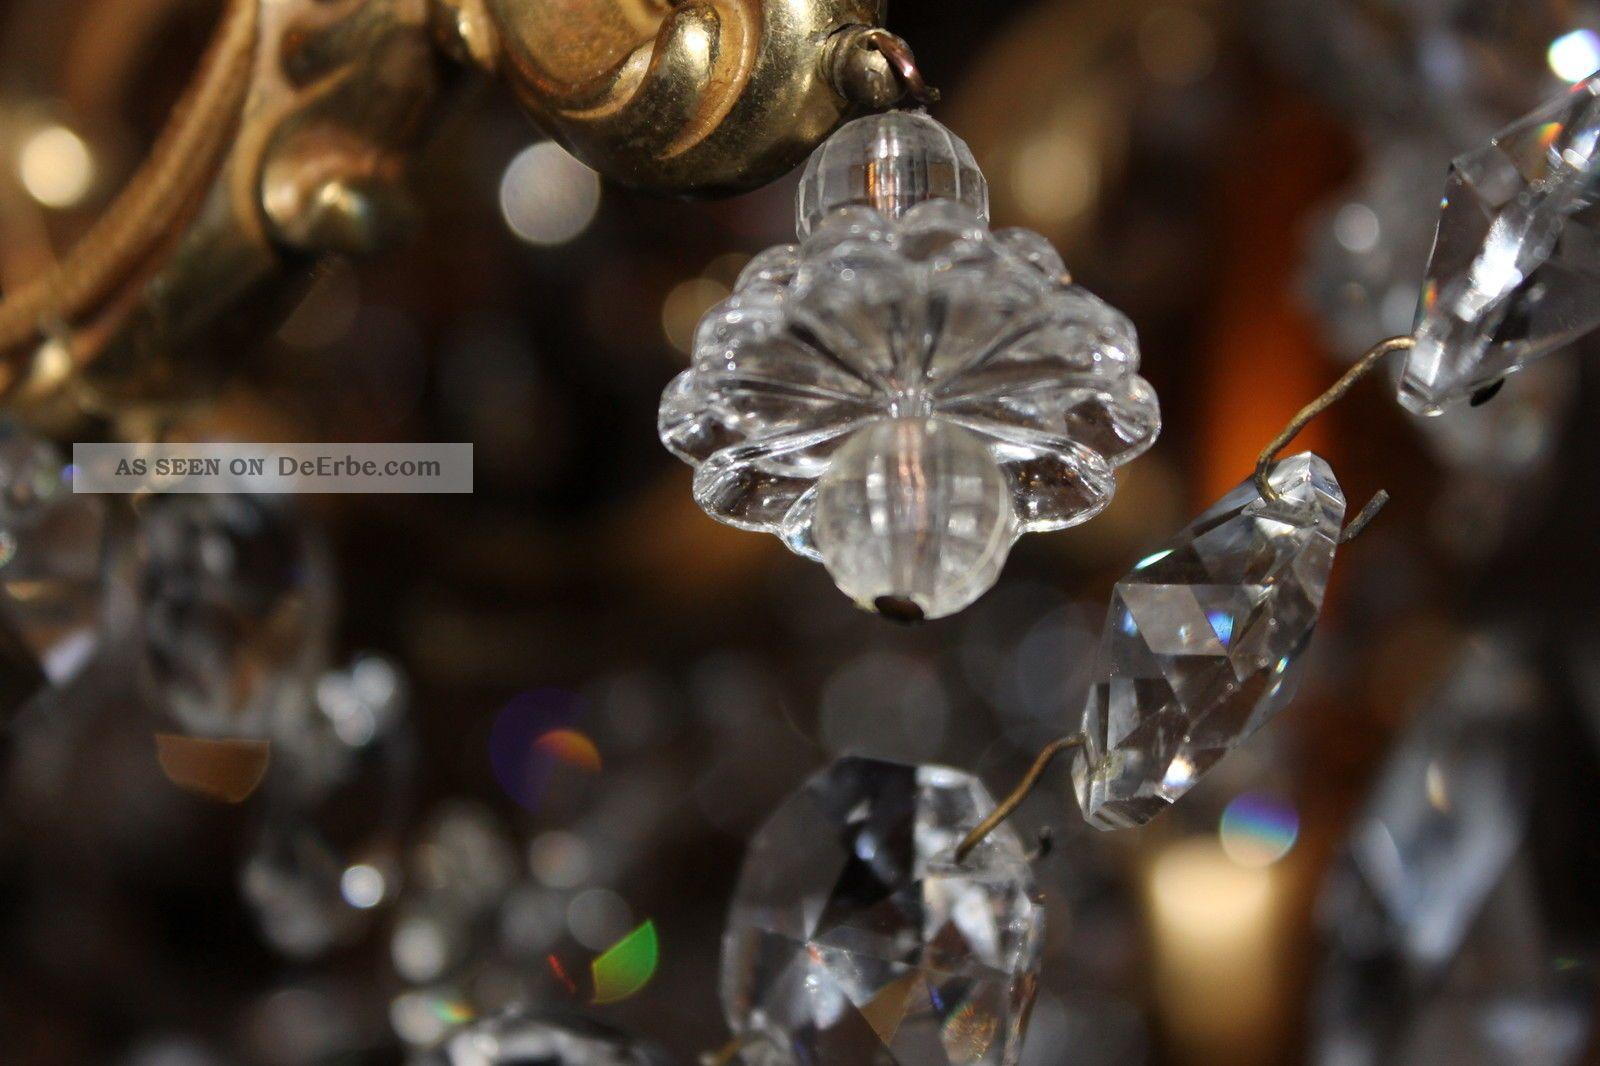 Kronleuchter 9 Flammig Kristall ~ Prunkvoller antiker lüster kronleuchter kristall prismen 6 flammig